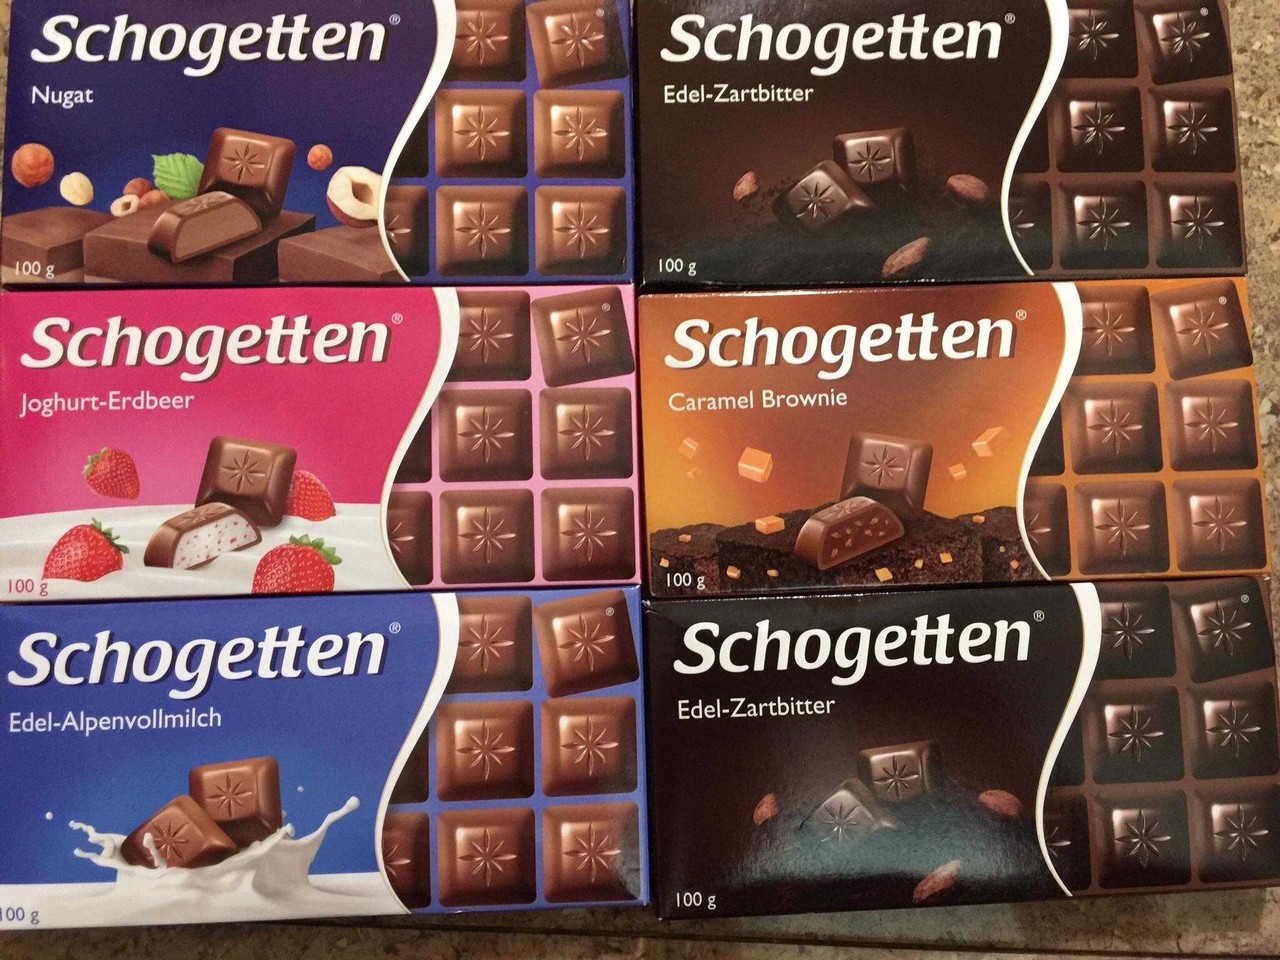 schogetten tablettes de chocolat allemand